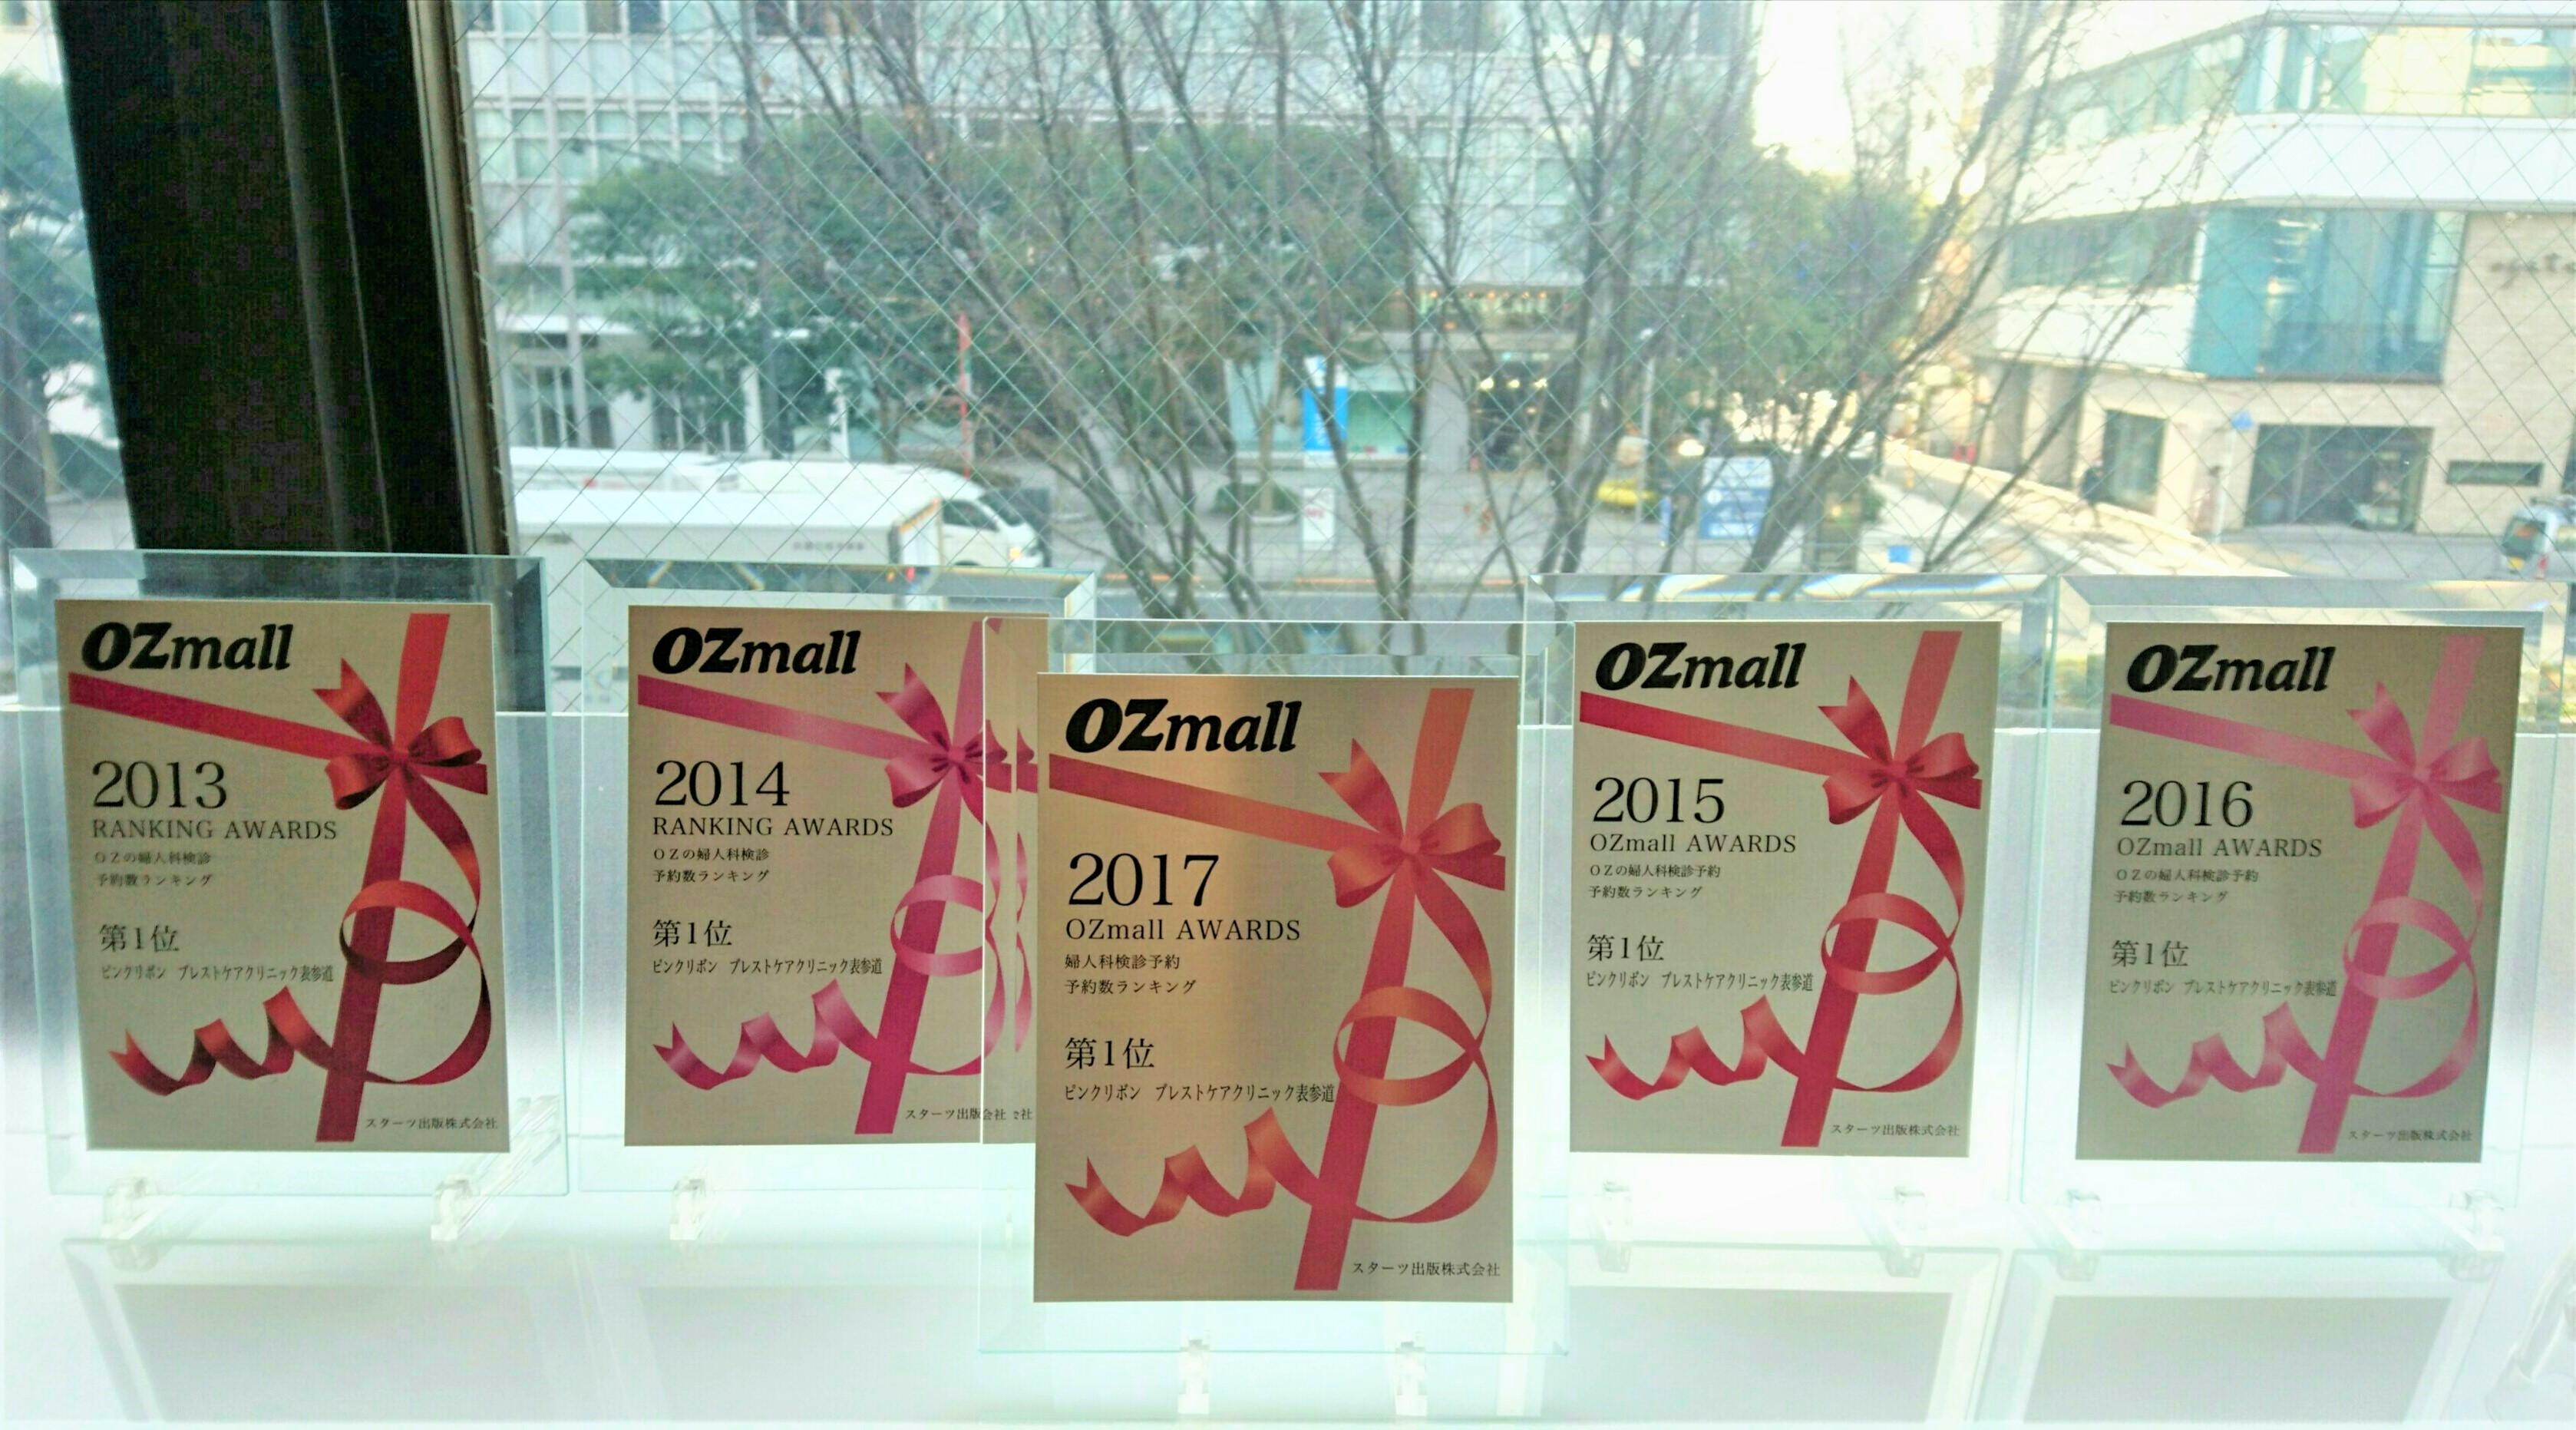 OZmollの婦人科検診予約数 5年連続で第一位